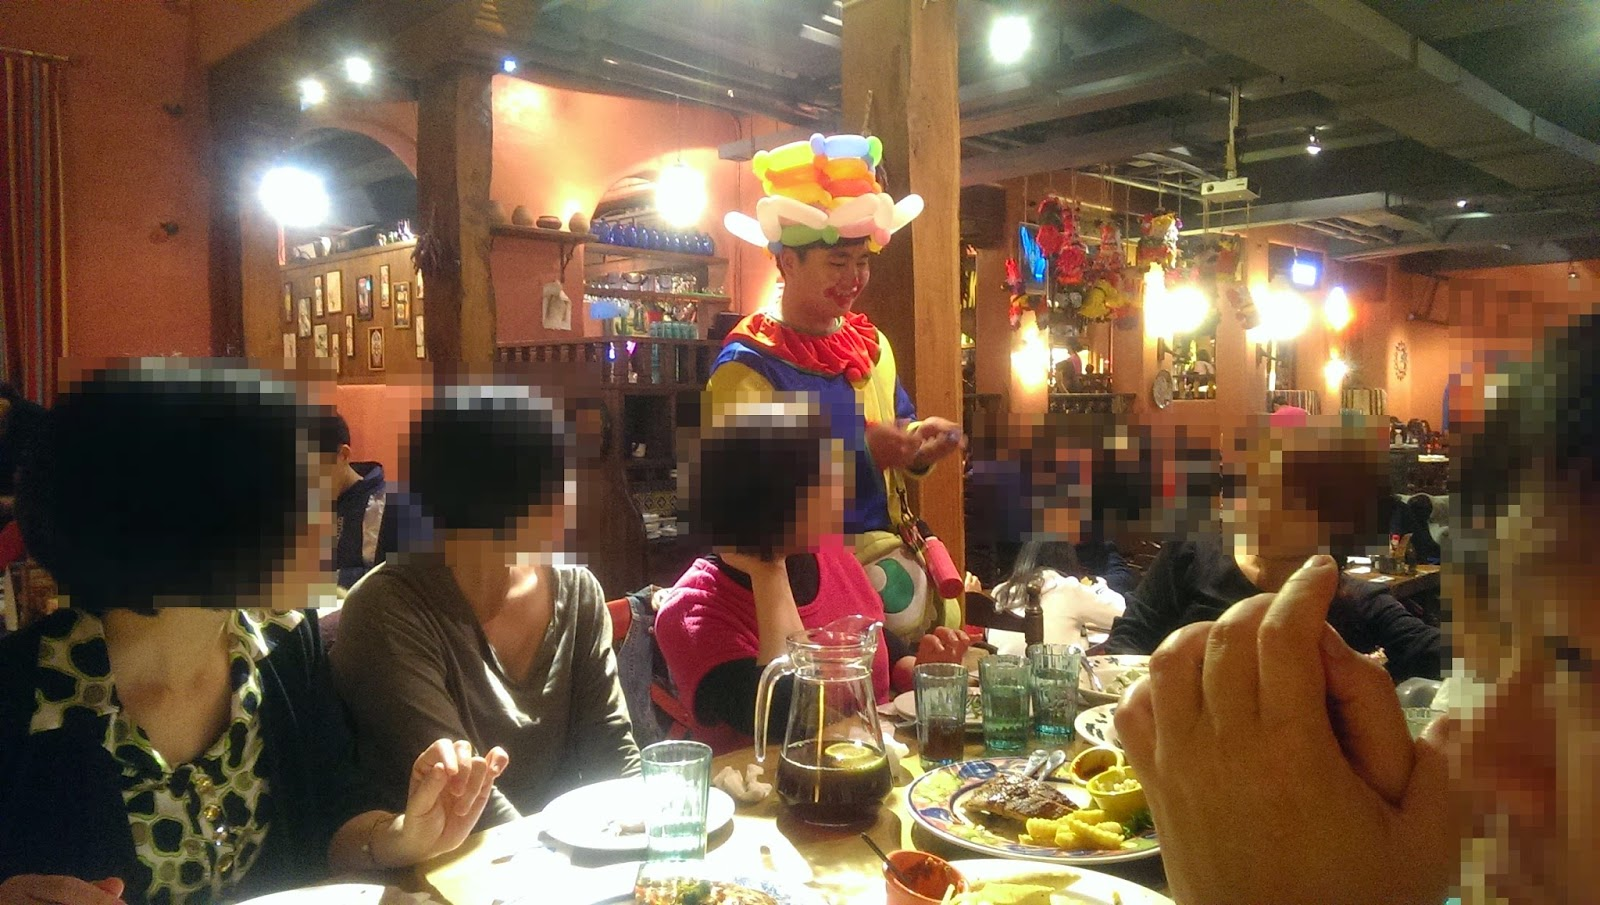 2015 01 24%2B19.22.29 - [食記] Smokey Joe's 冒煙的喬 高雄左營的美式墨西哥餐廳!